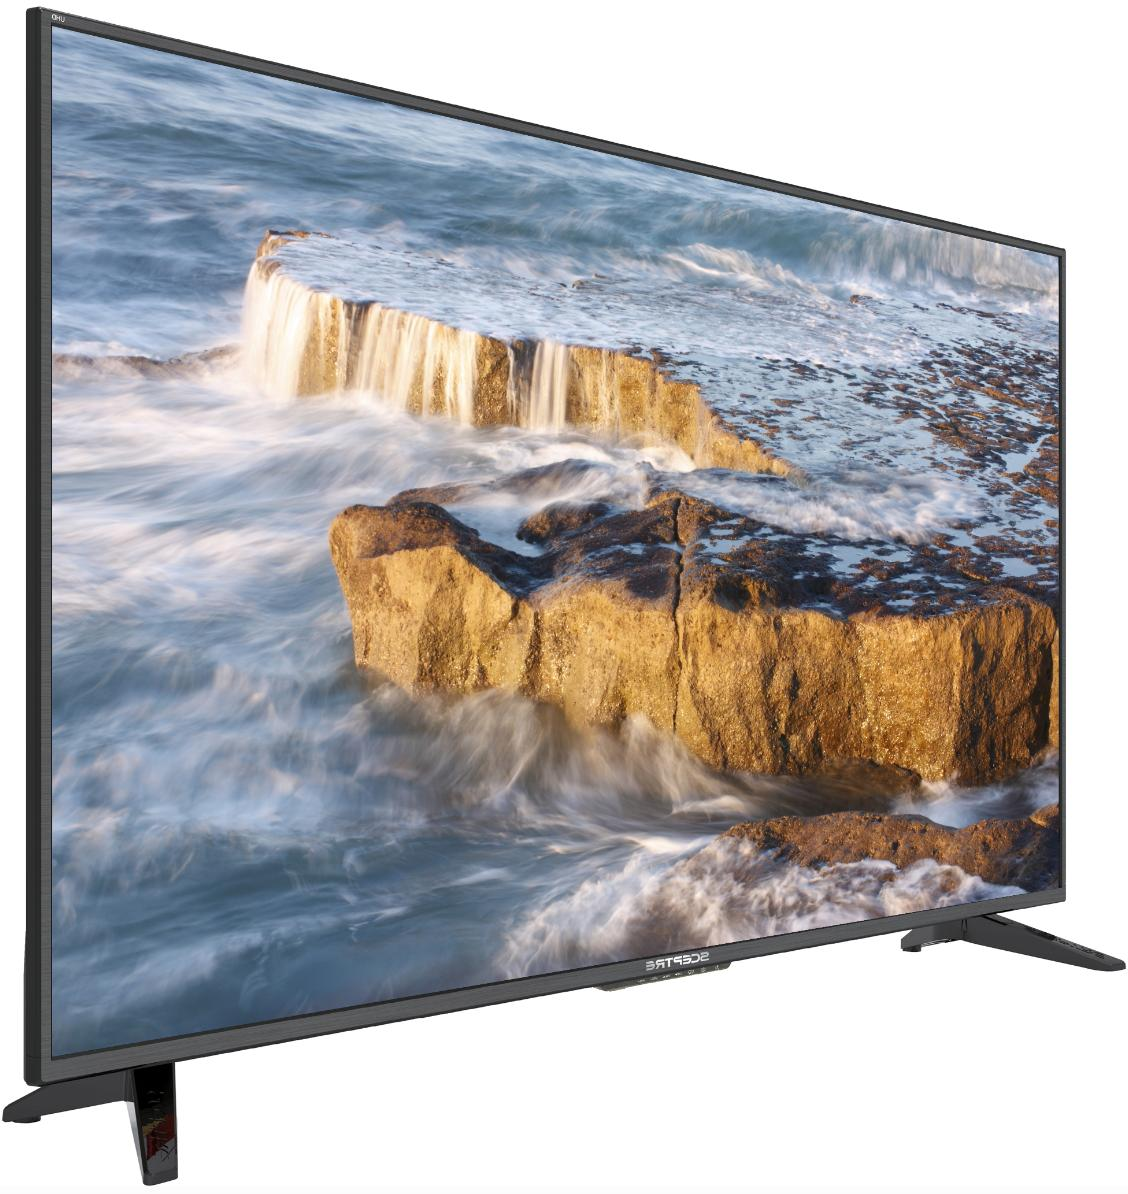 50 inch tv 4k uhd led hdr